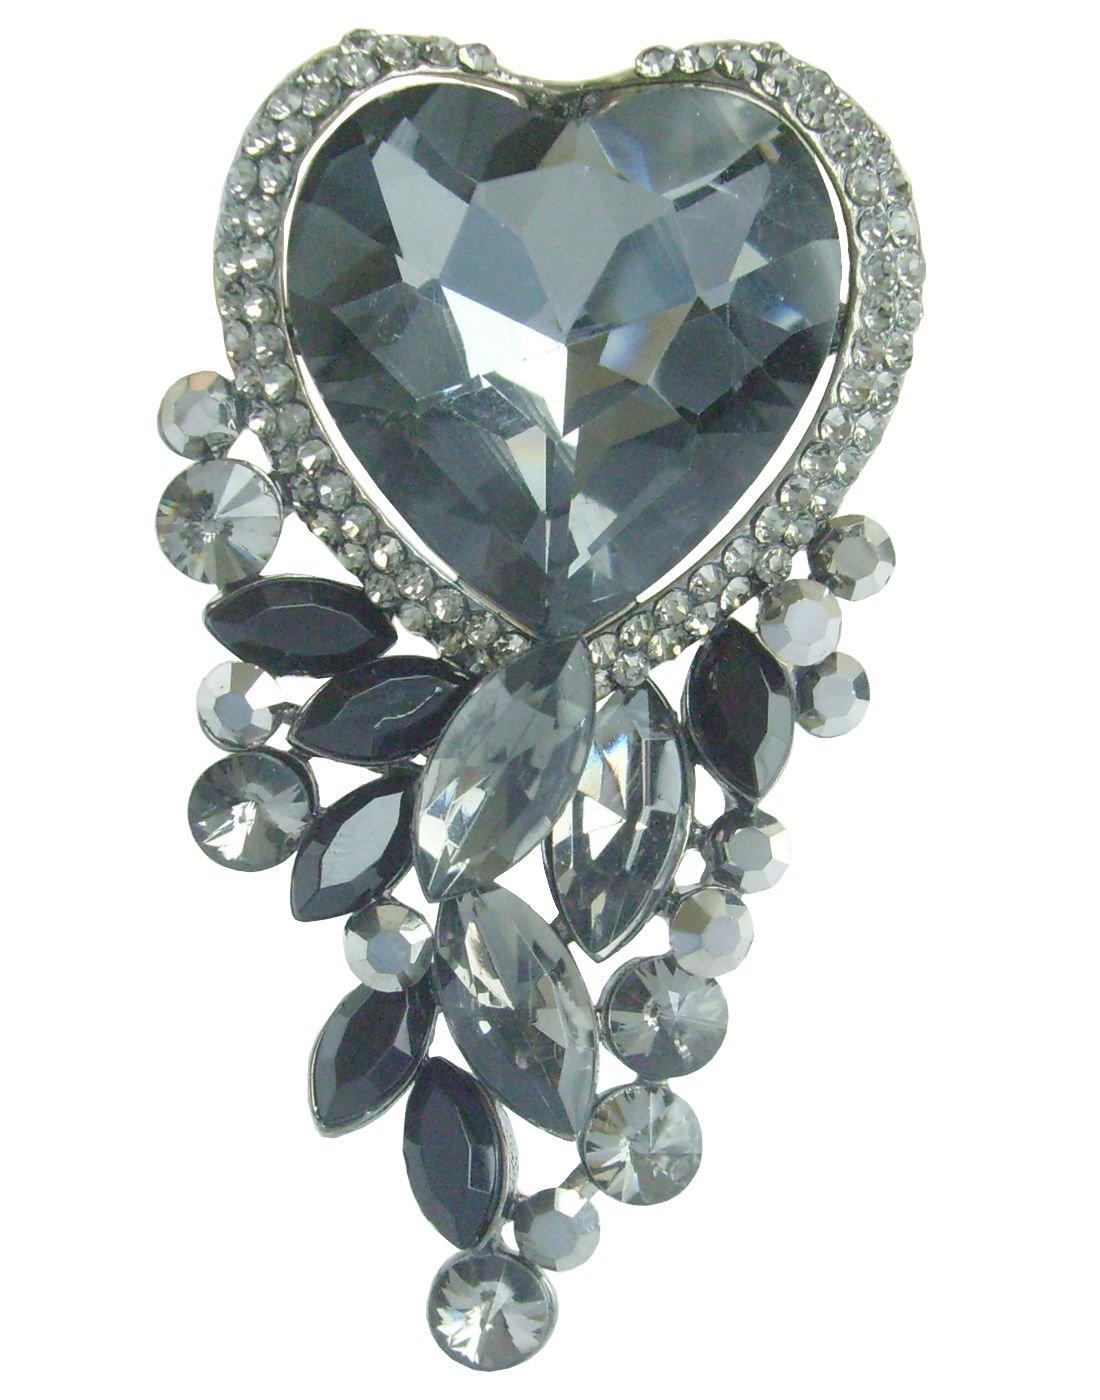 Sindary Wedding 2.56'' Rhinestone Crystal Love Heart Flower Brooch Pin Pendant BZ2079 (Black Tone Black&Gray)